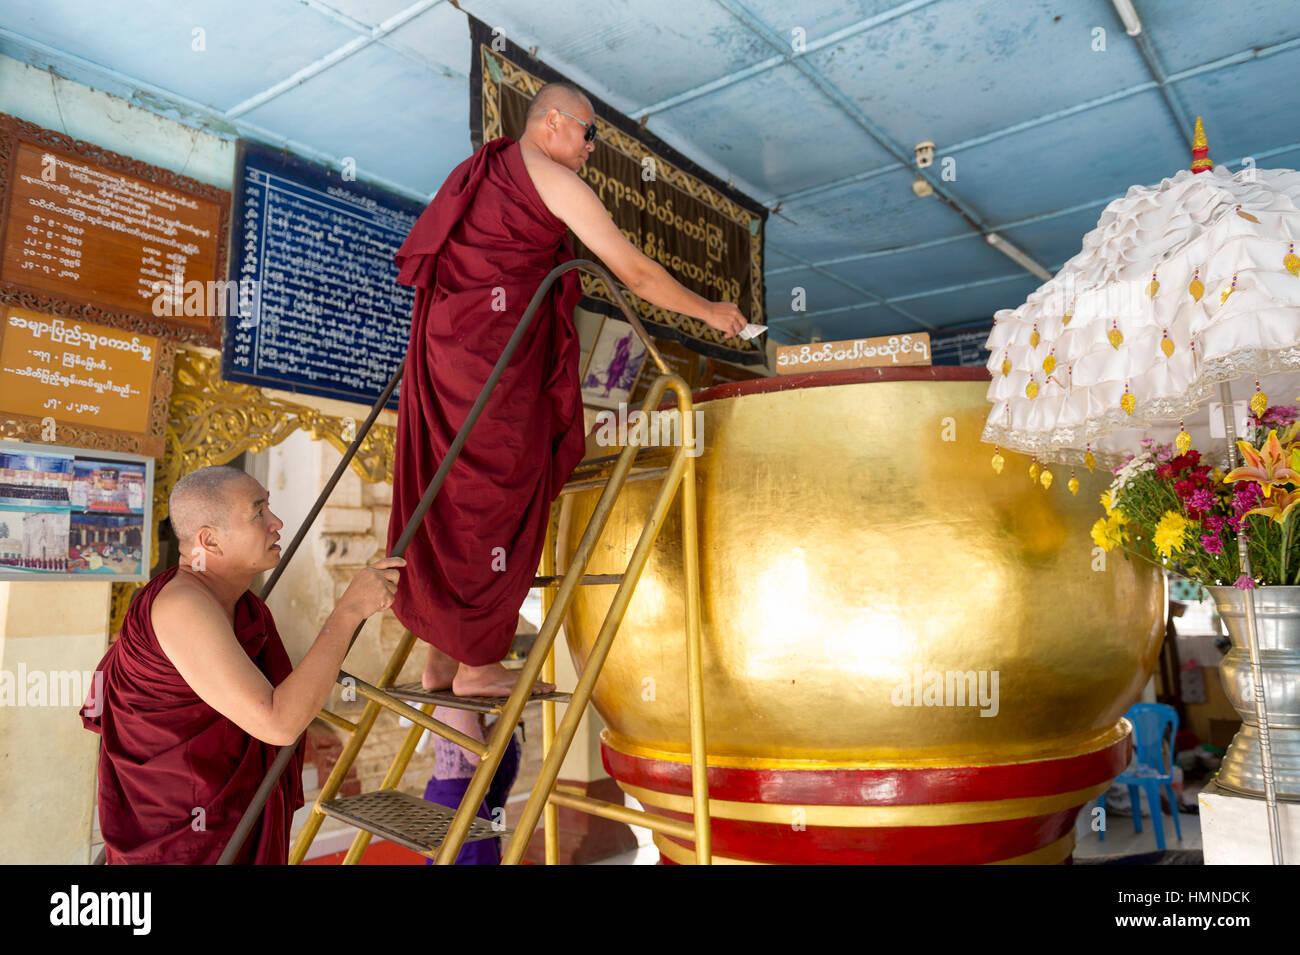 Myanmar (ex Birmanie). Bagan, Mandalay region. Temple of Manuha Paya. Monks depositing an offering in an immense - Stock Image